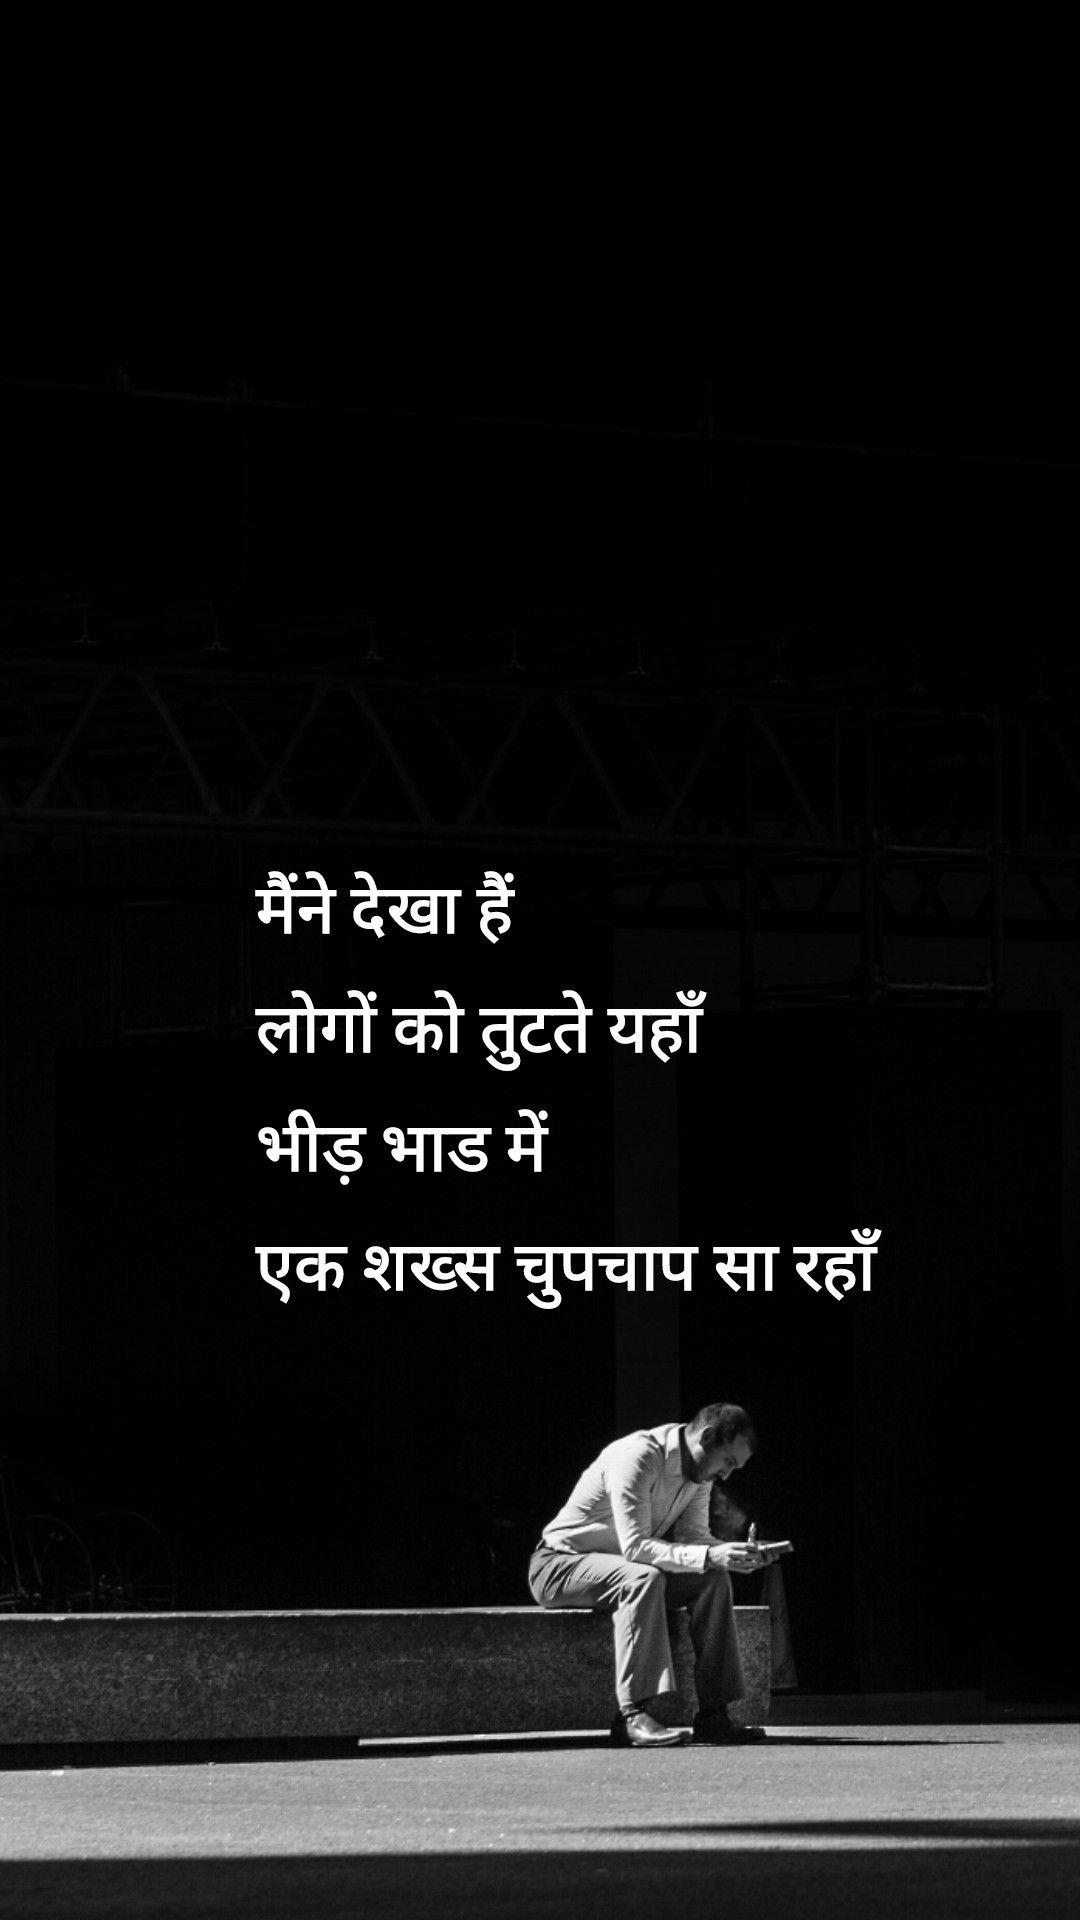 मन दख ह Hindi Words Lines Black Alone